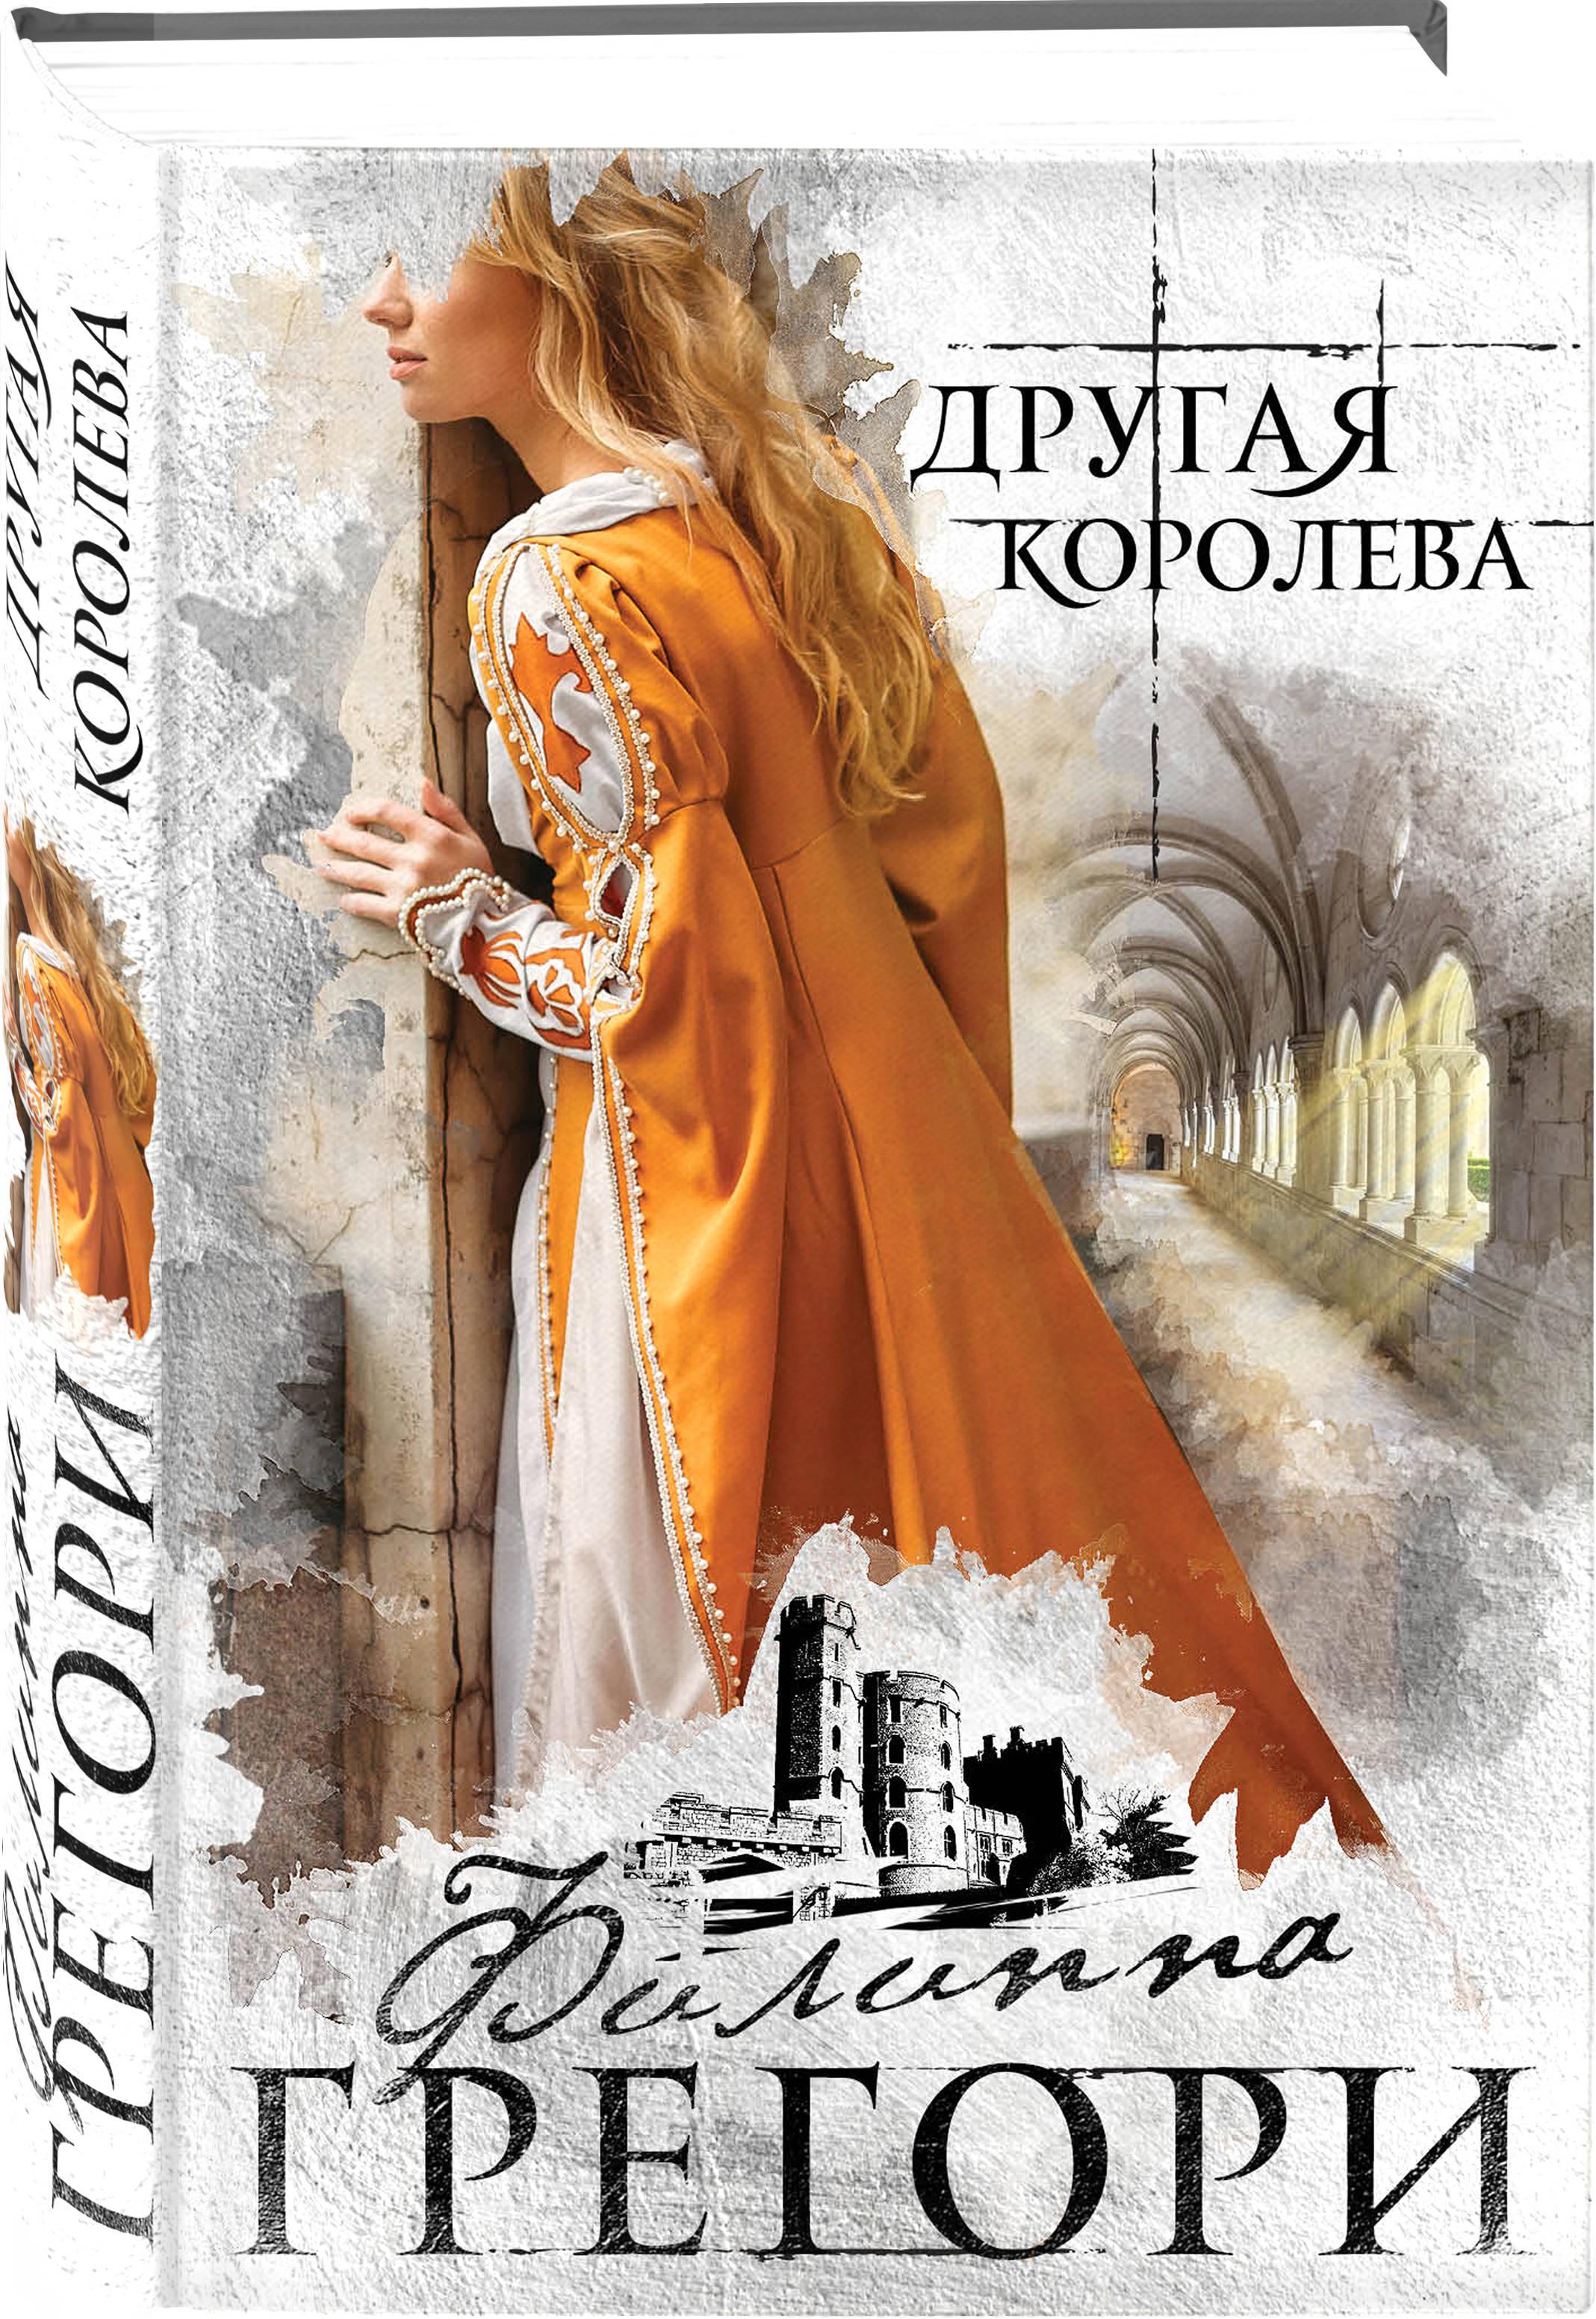 Филиппа Грегори Другая королева елизавета i